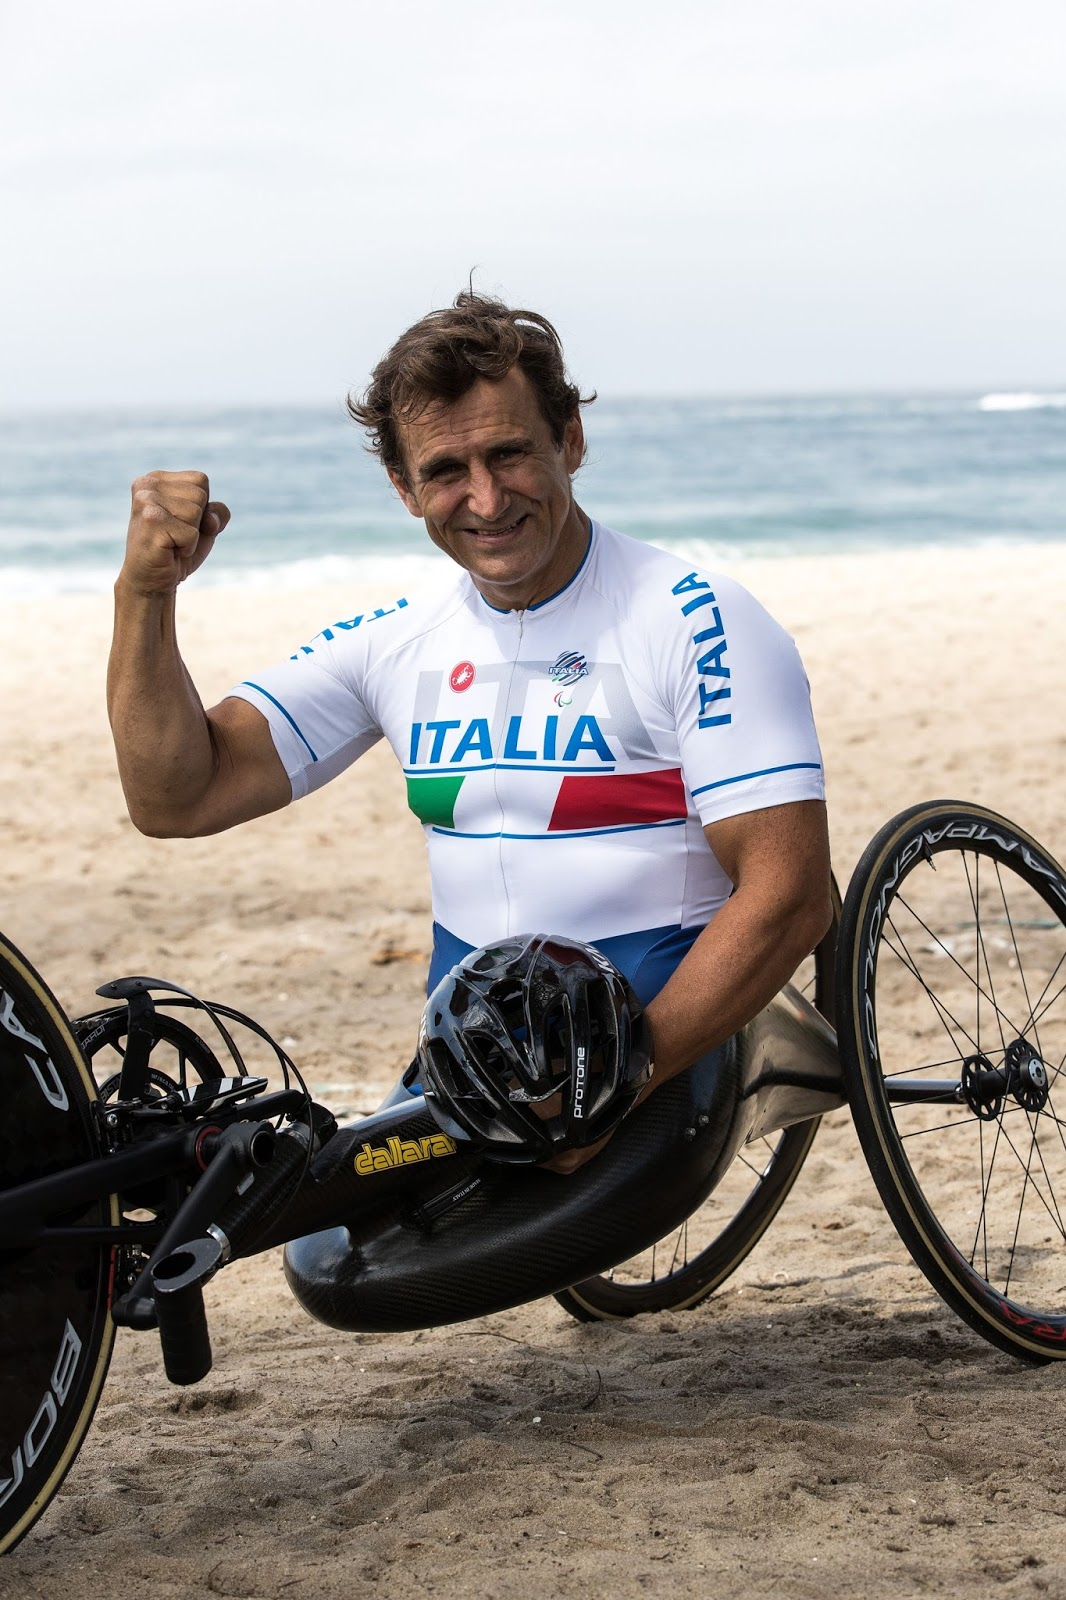 Former F1 And Cart Driver Alex Zanardi Wins Paralympic Gold